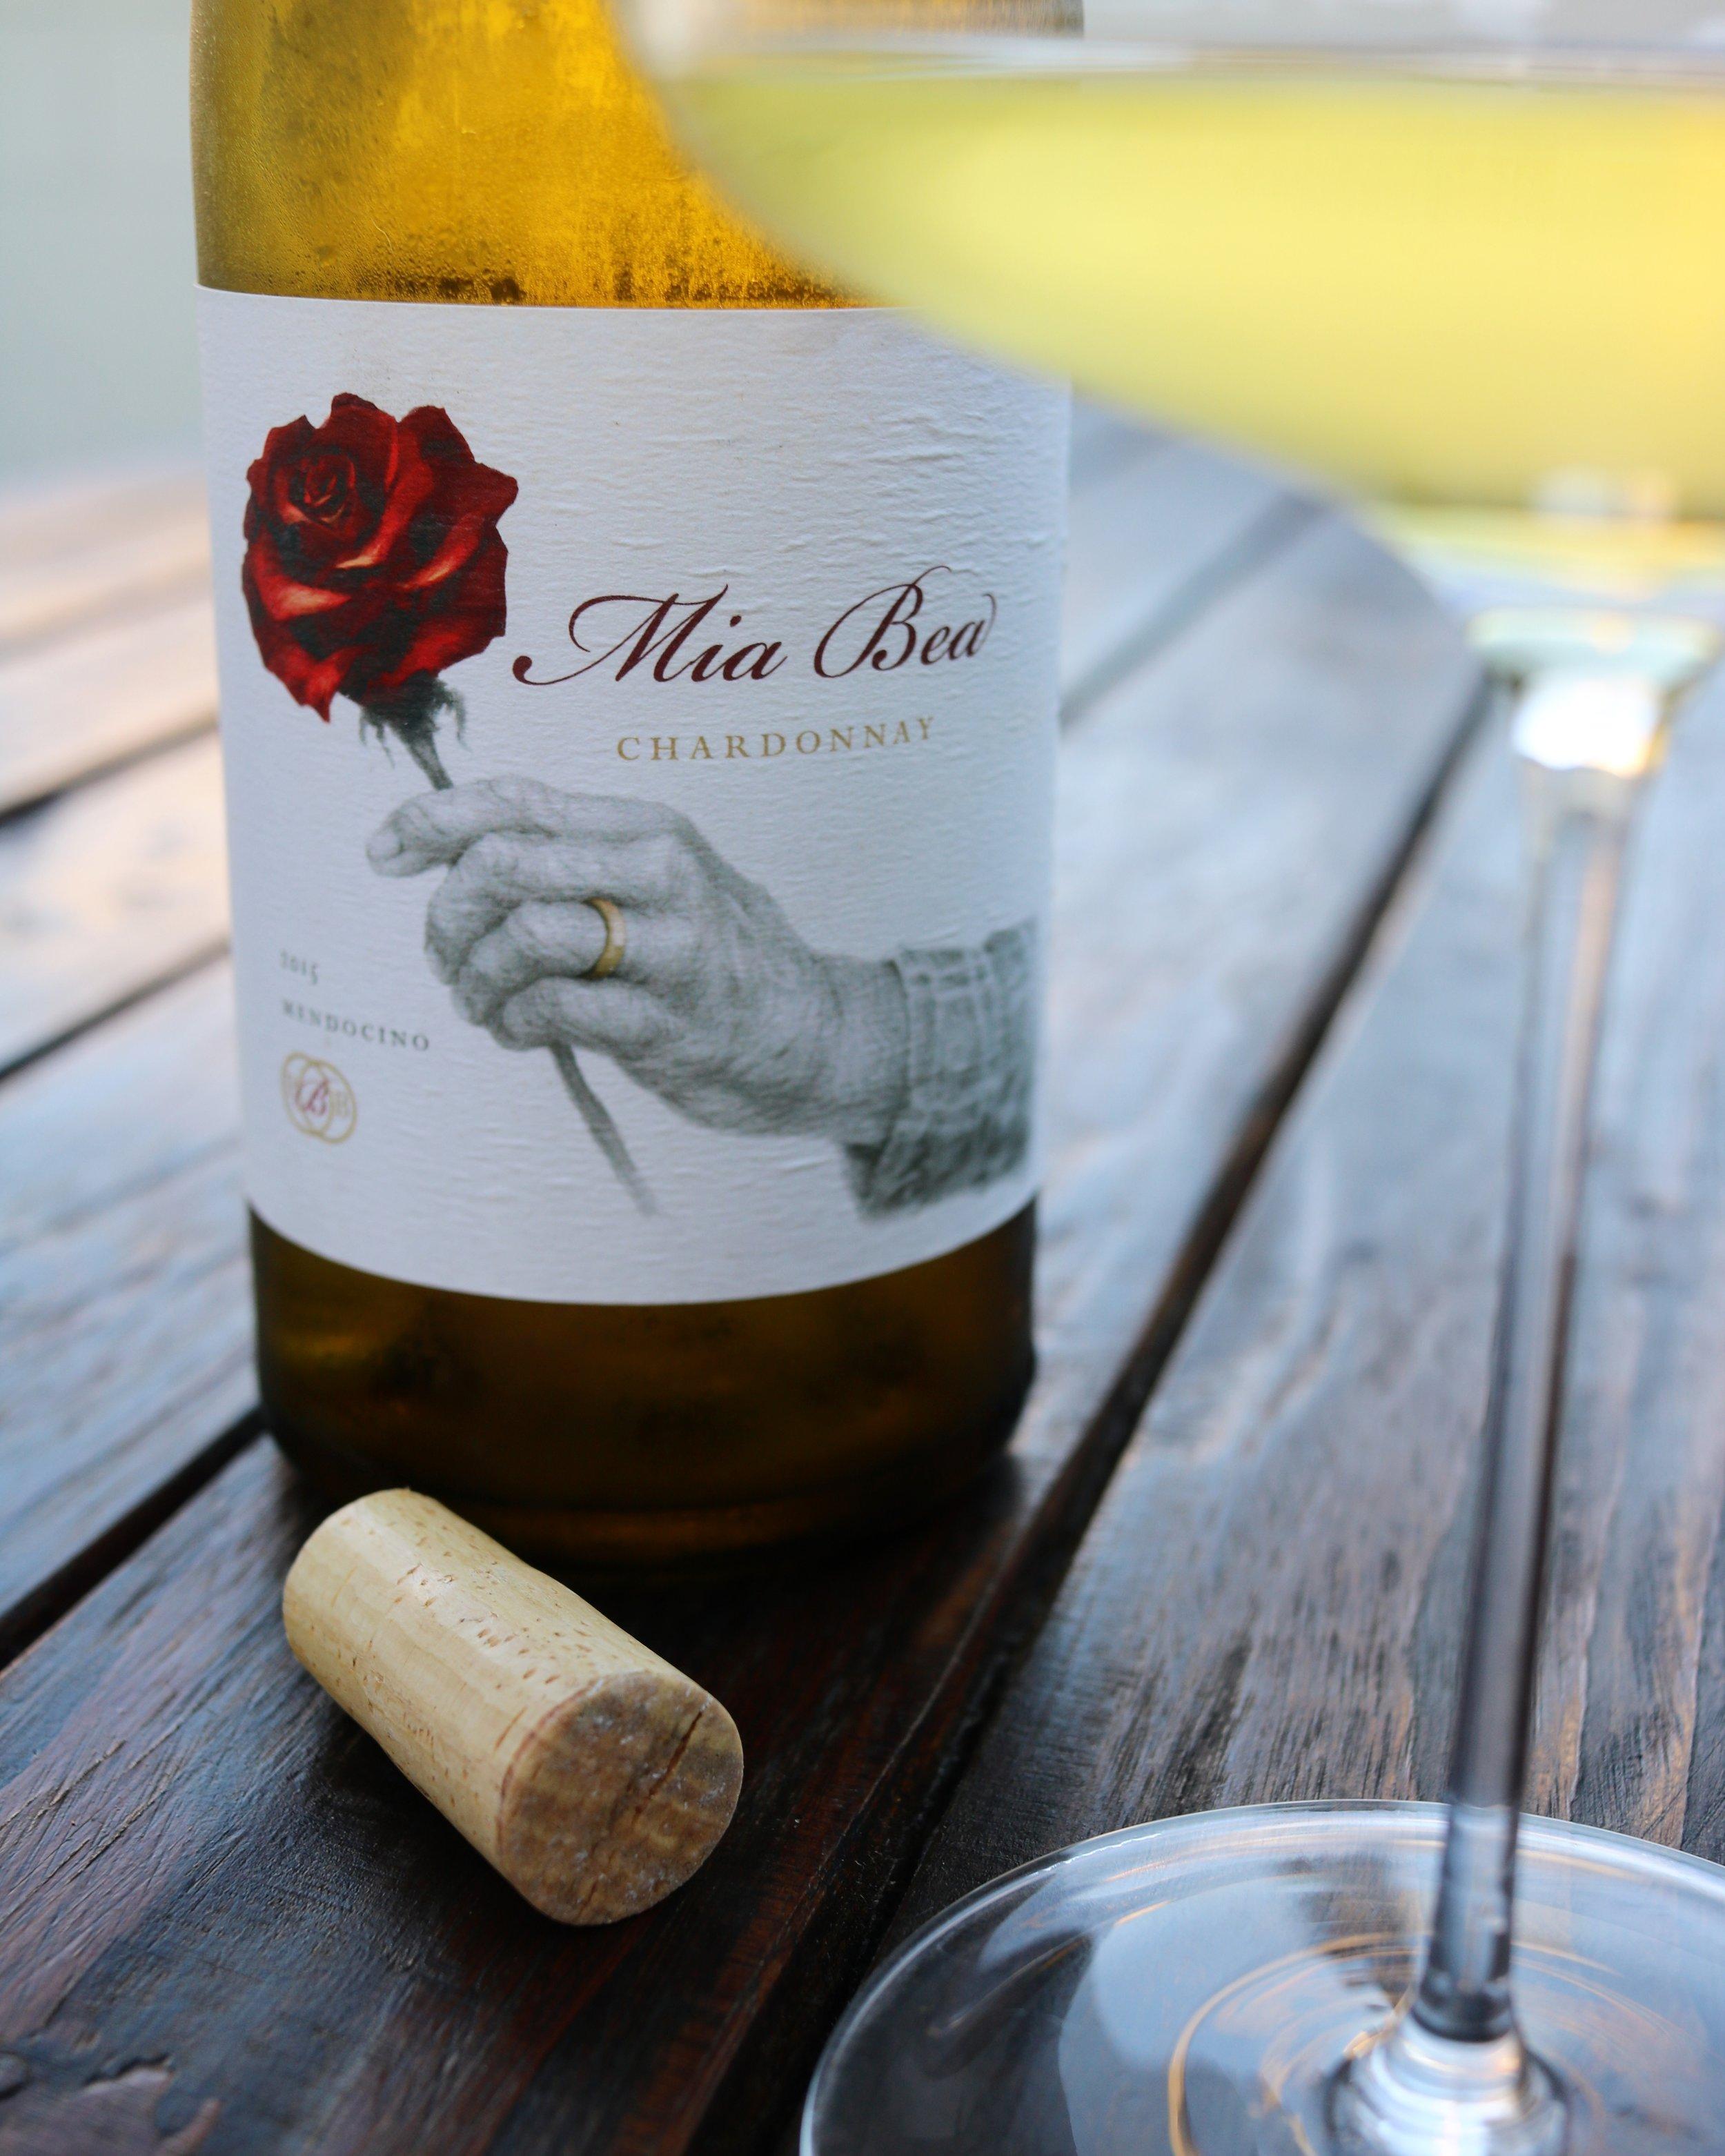 Mia Bea Chardonnay.jpg